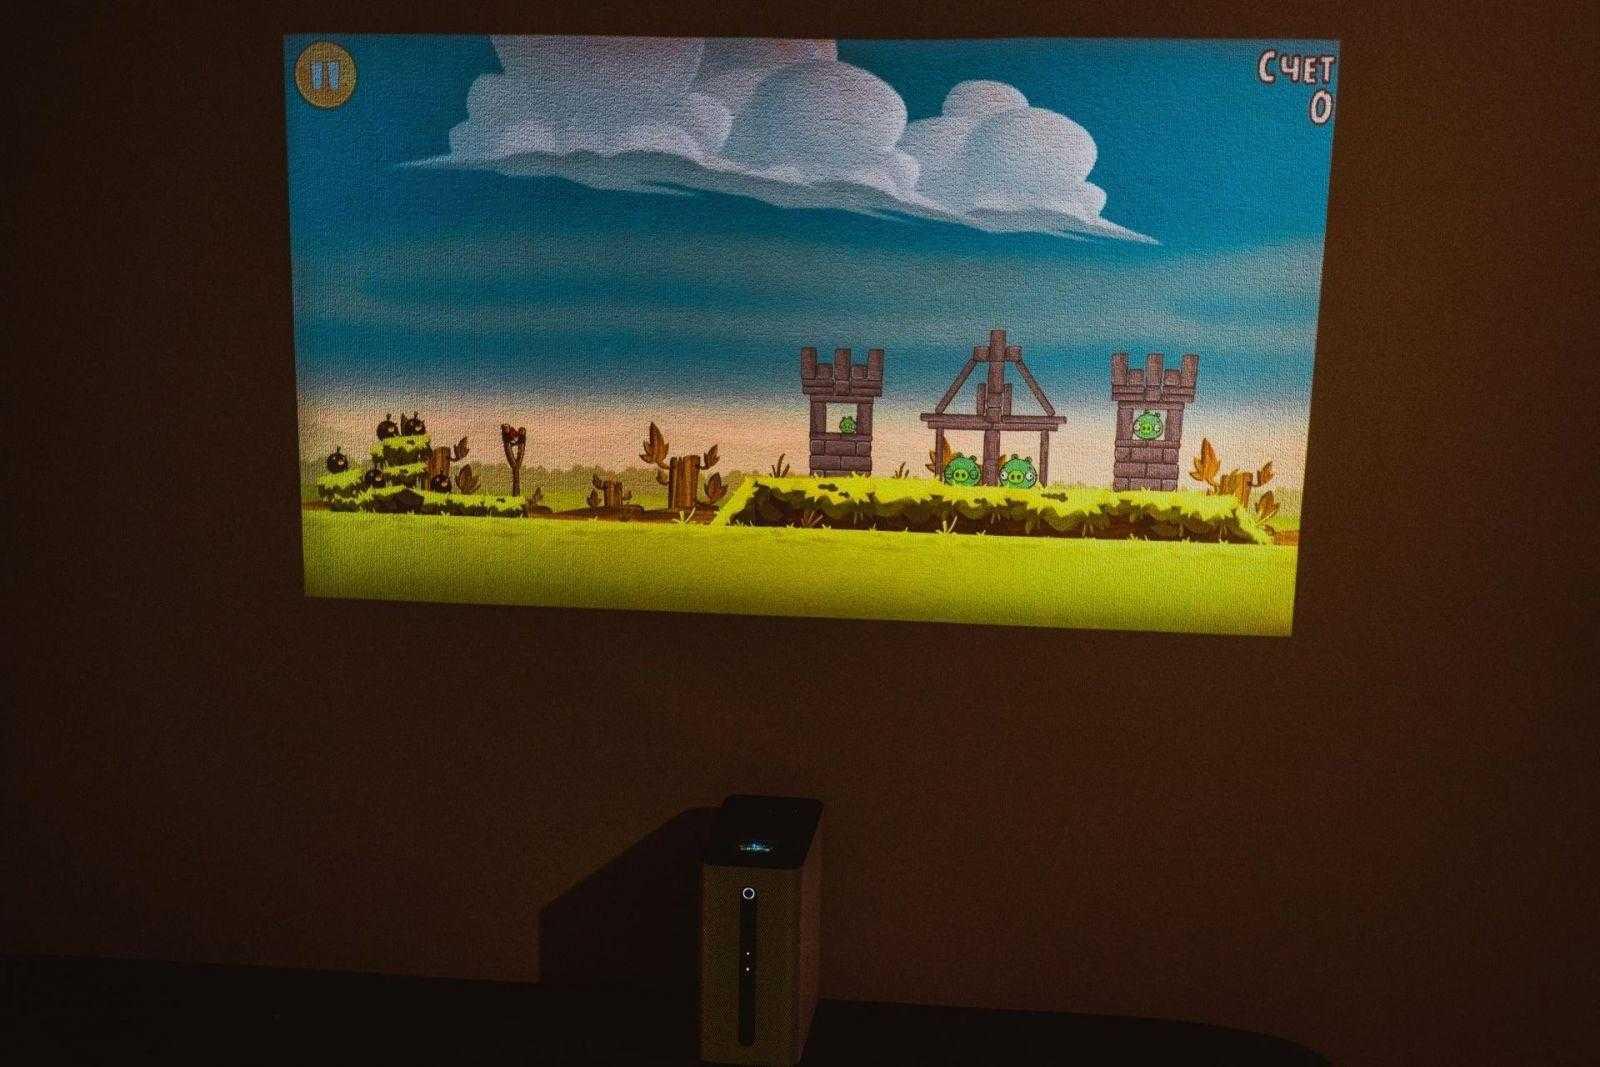 DSC 5997 - Обзор проектора Sony Xperia Touch. Потрогай виртуальность